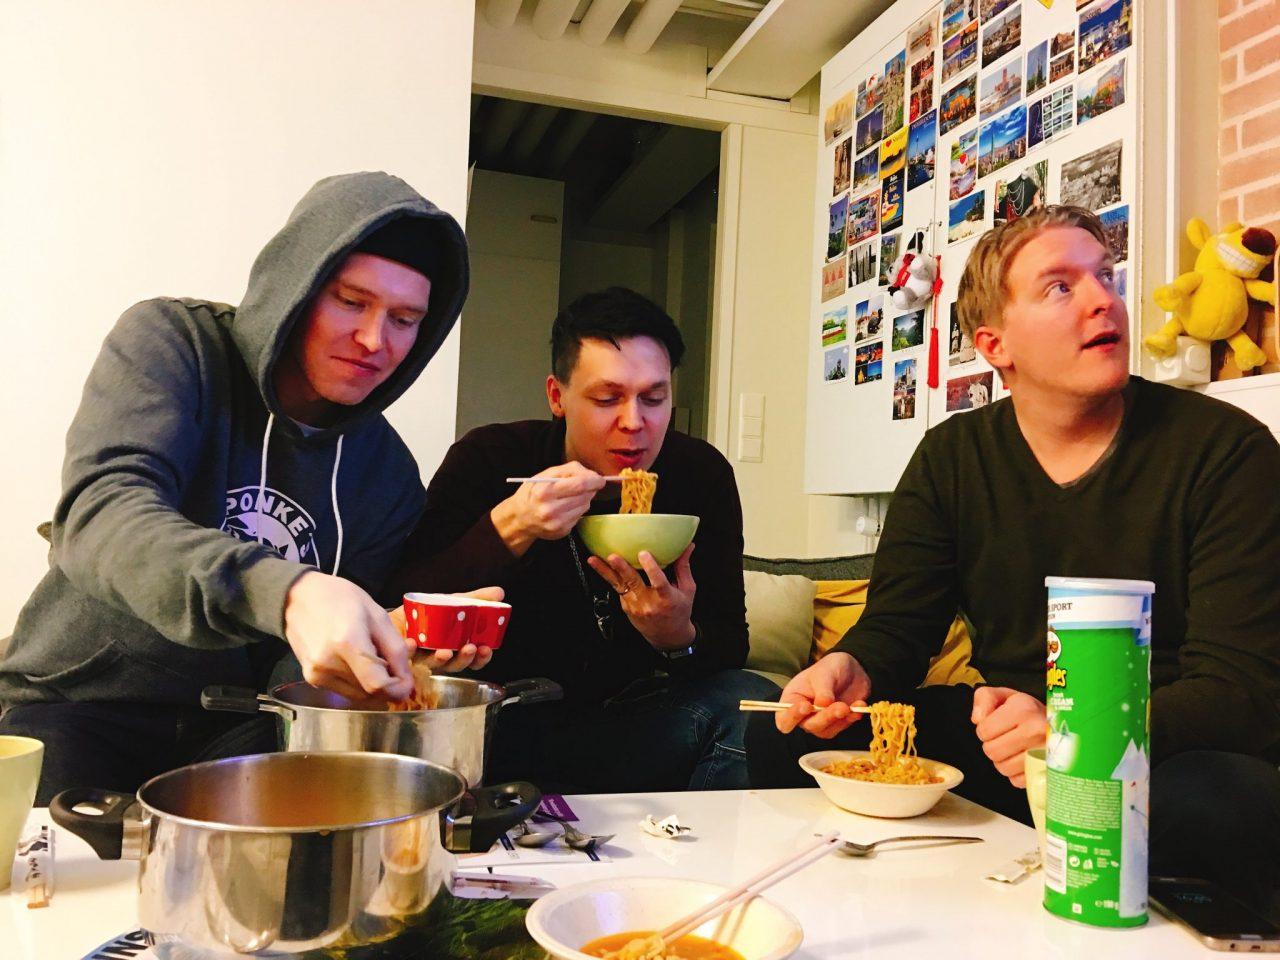 Men having ramen